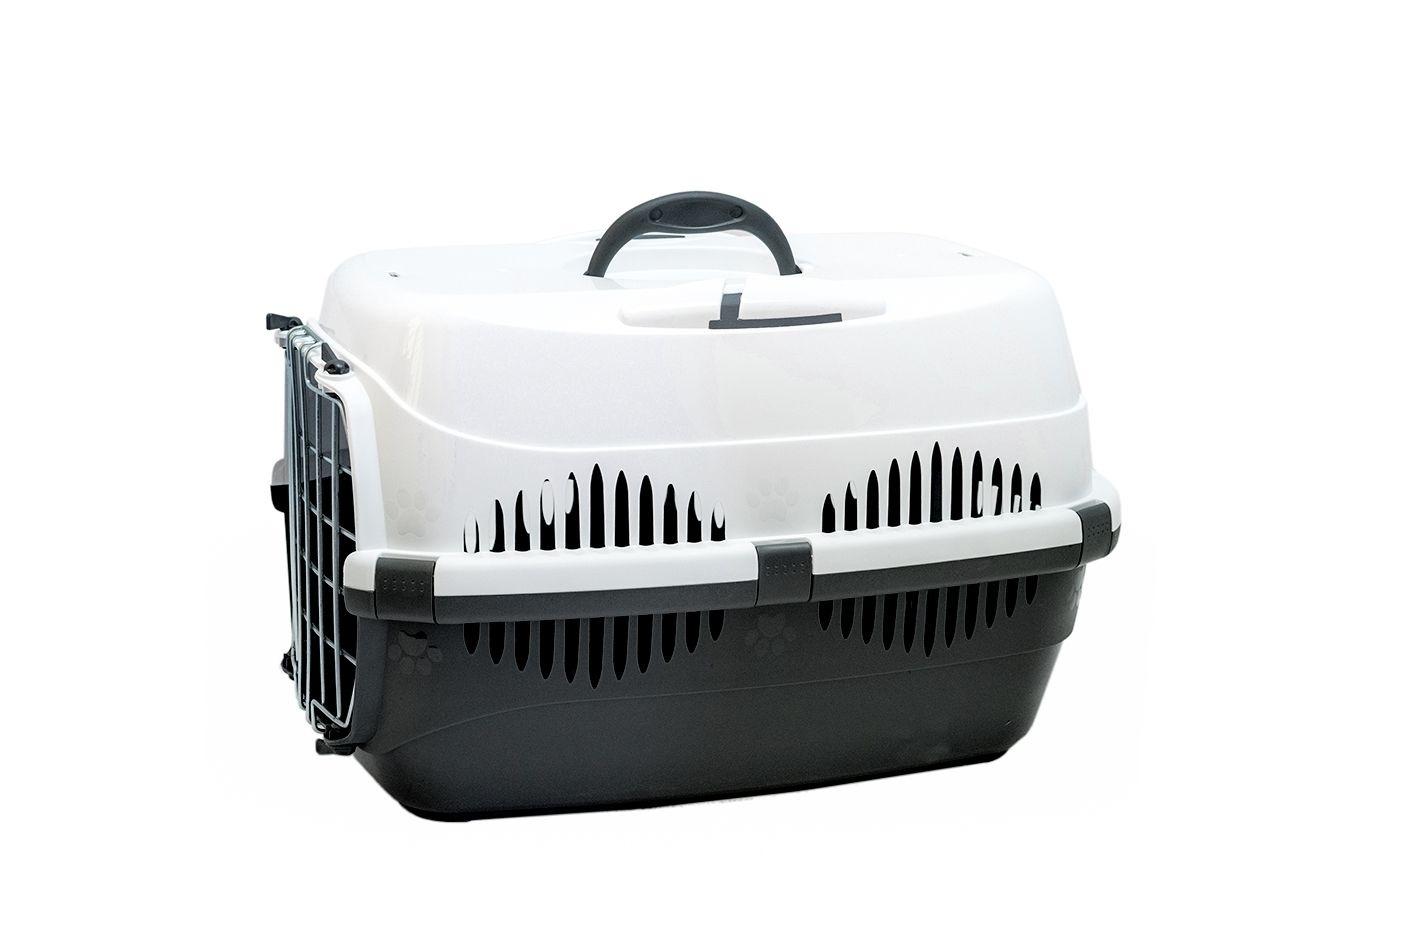 Yami-Yami Yami-Yami переноска для животных Спутник-2, темно-серая с белым (1,27 кг) yami yami 1шт игрушка мячик пластмассовый для кошек 3 5см 2400 0 007 кг 2 шт